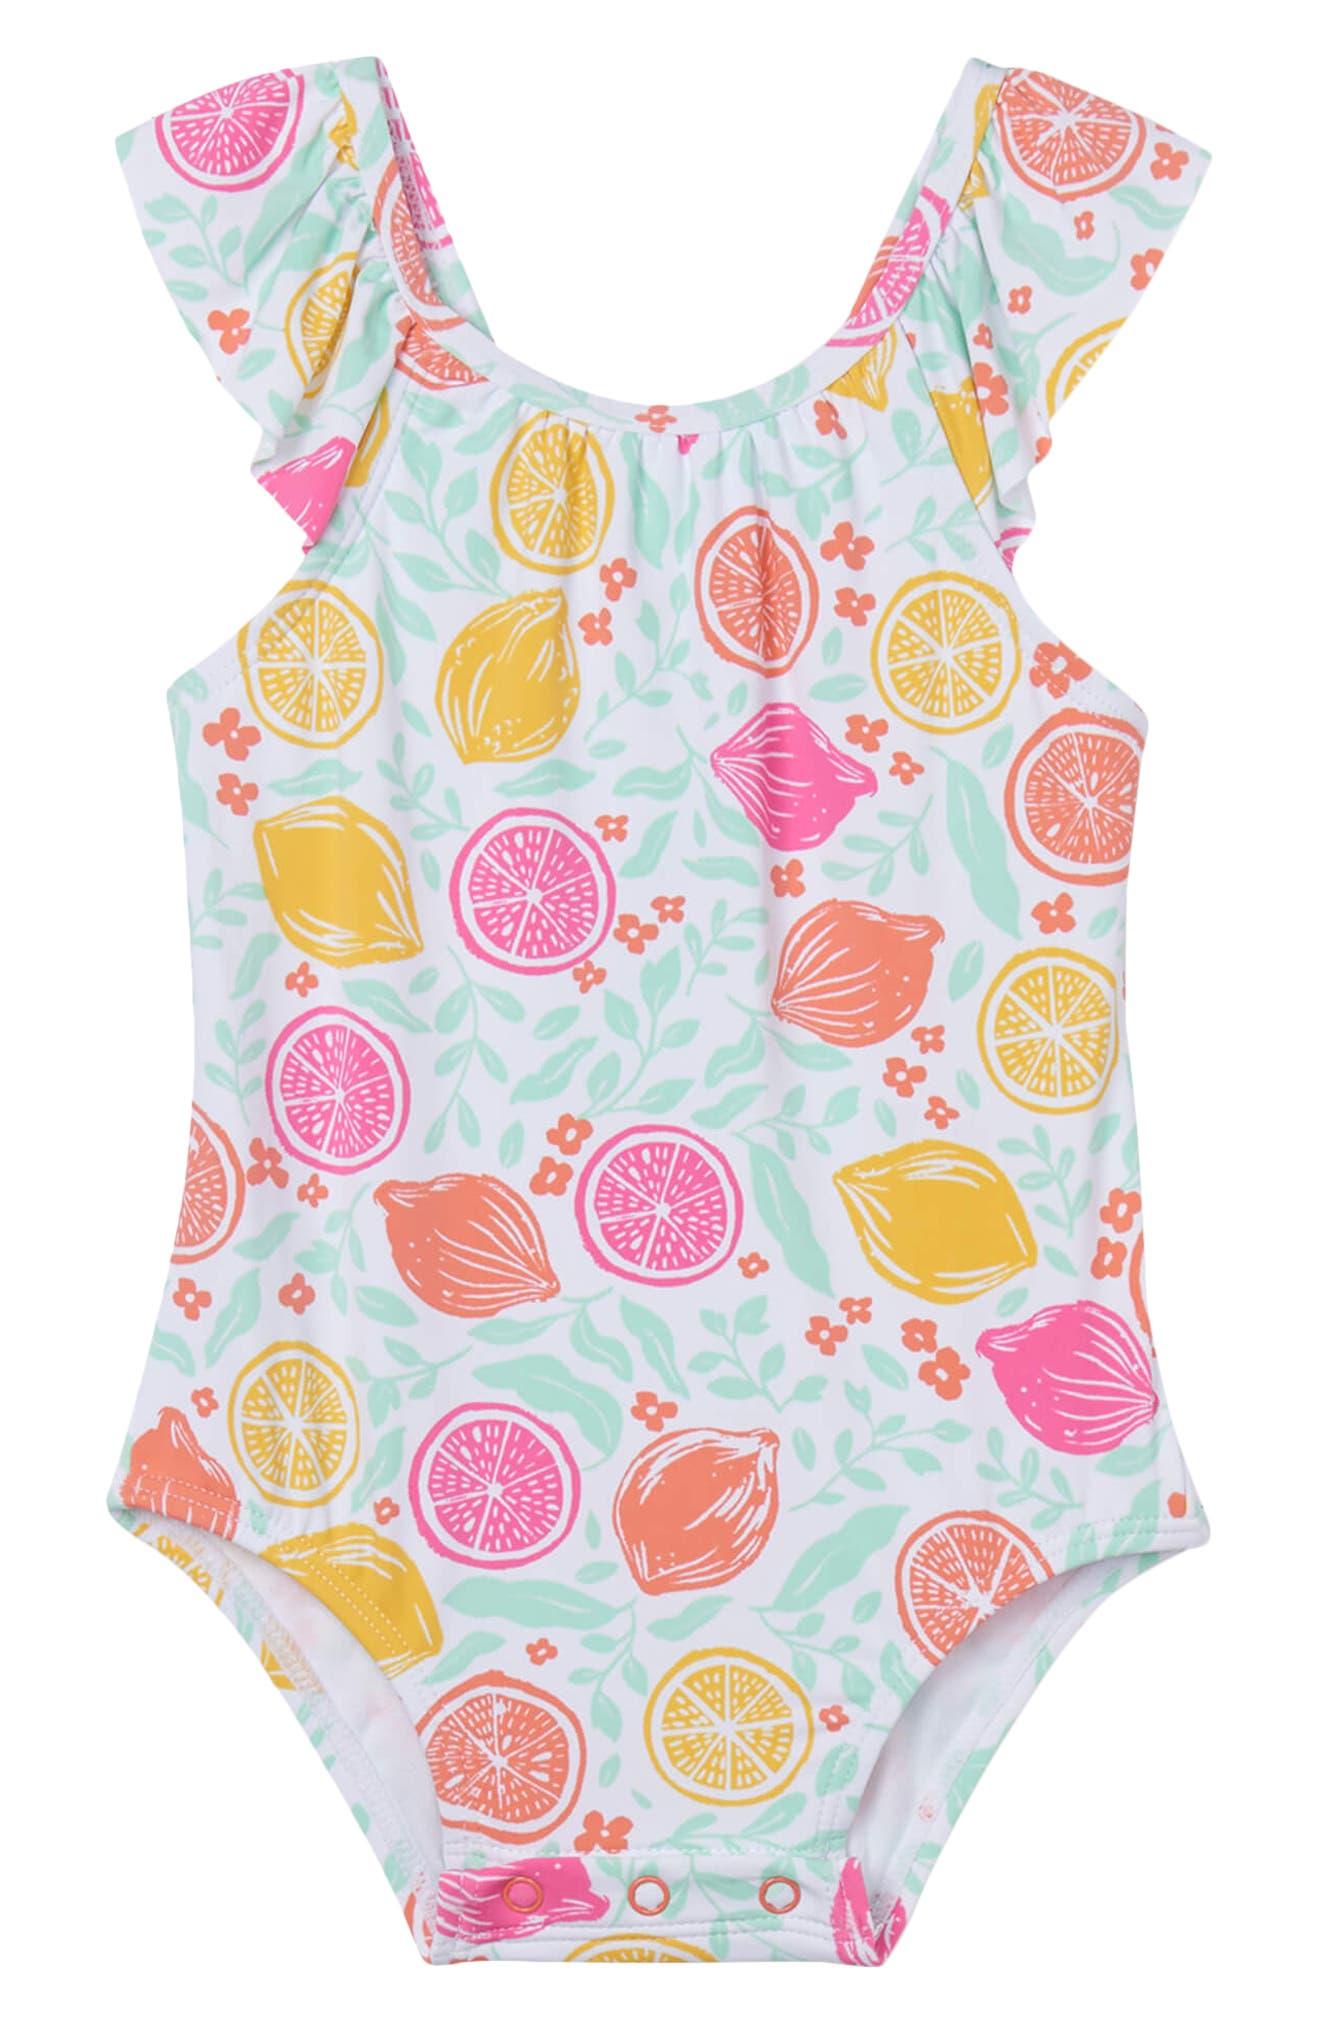 LNGRY Baby Swimwear,Toddler Teen Kids Girls Cartoon Swan Ruffle Zipper Long Sleeve Sunproof One-Piece Swimsuit